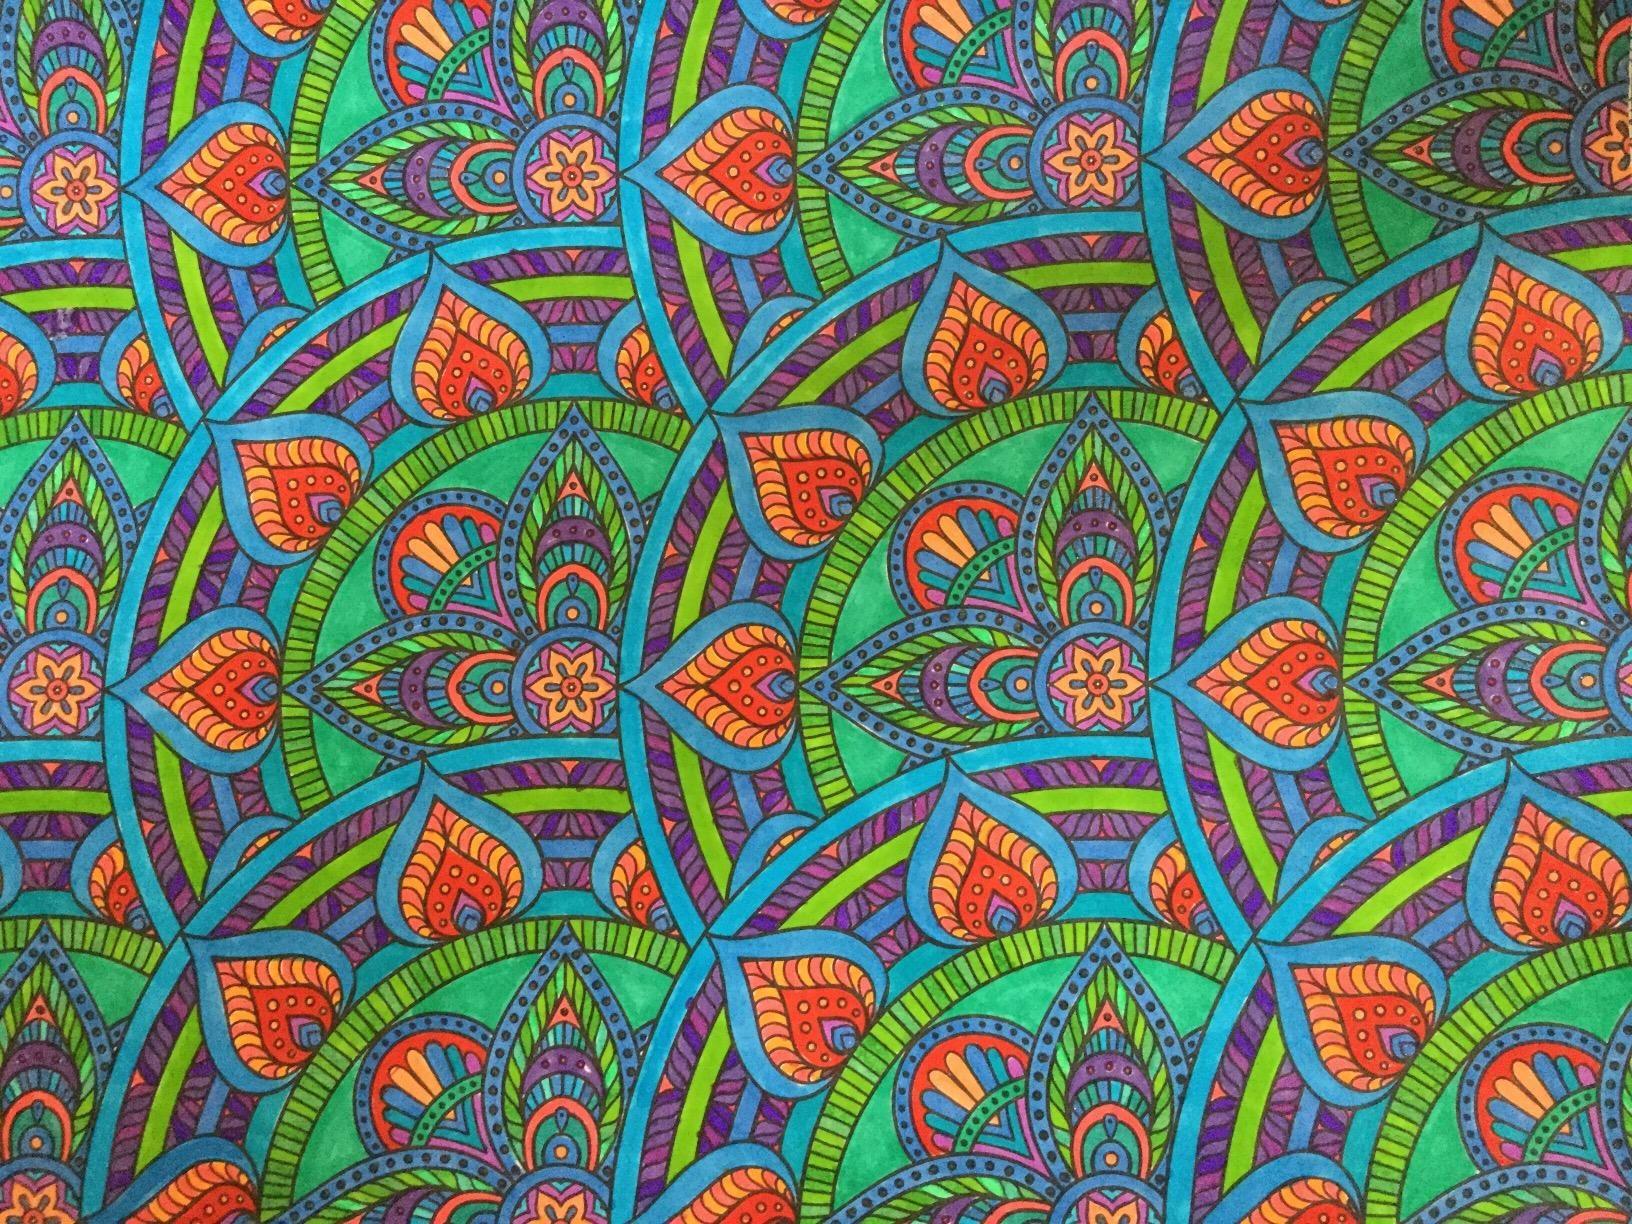 Color art mandala wonders - Amazon Com Mandala Wonders Color Art For Everyone Leisure Arts 6765